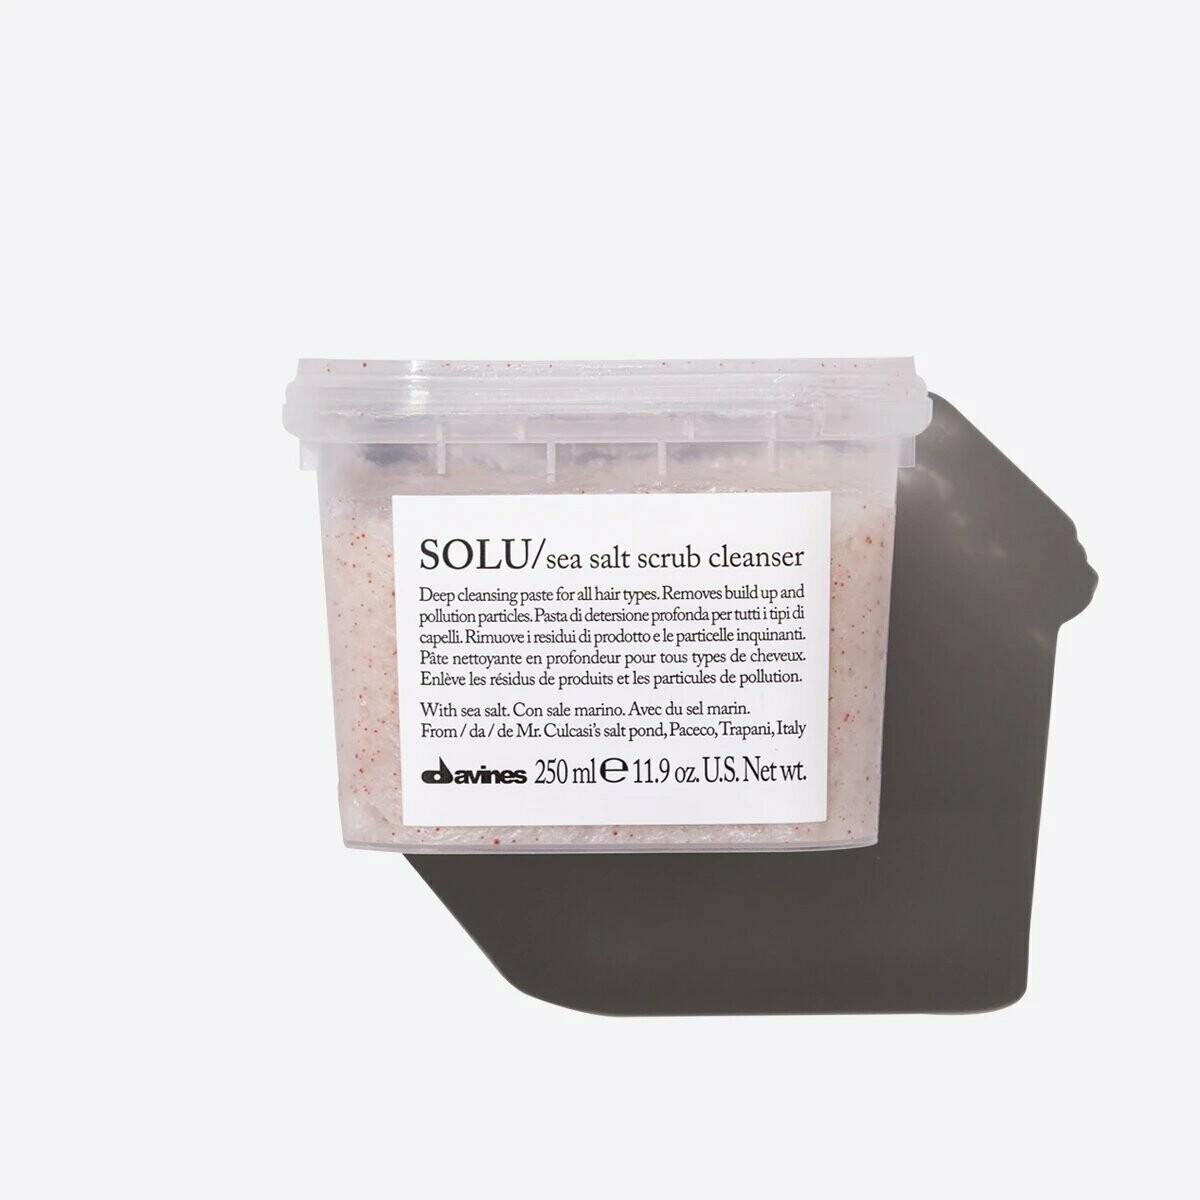 SOLU Sea Salt Scrub Cleanser